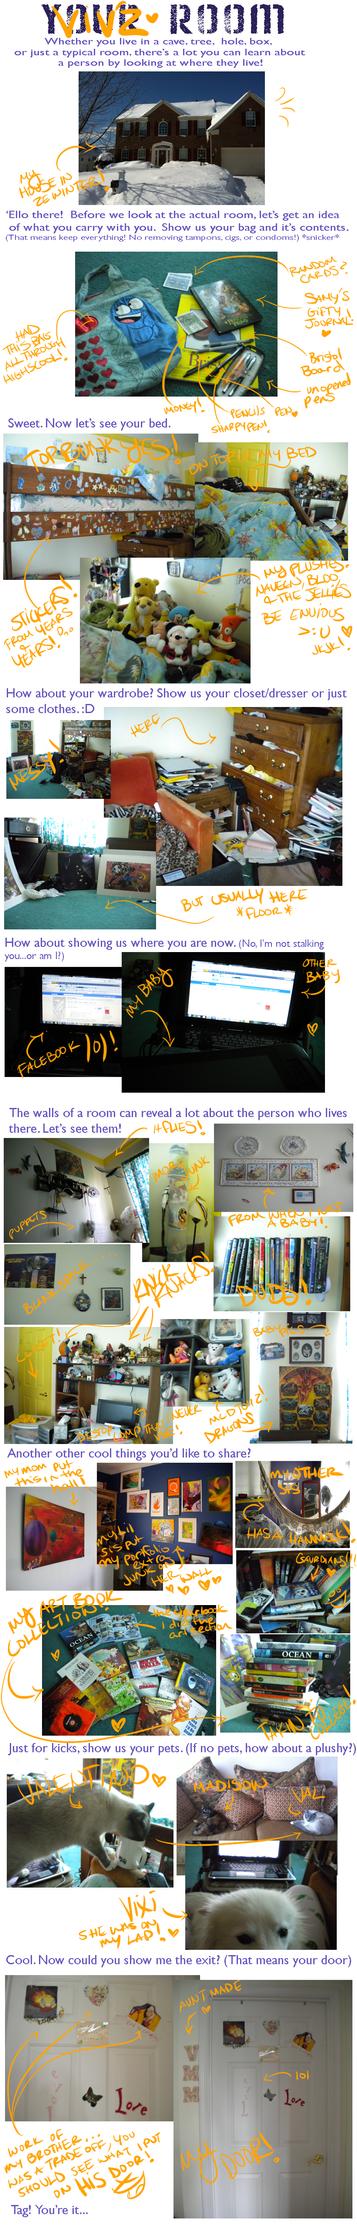 My Room Meme by VivzMind